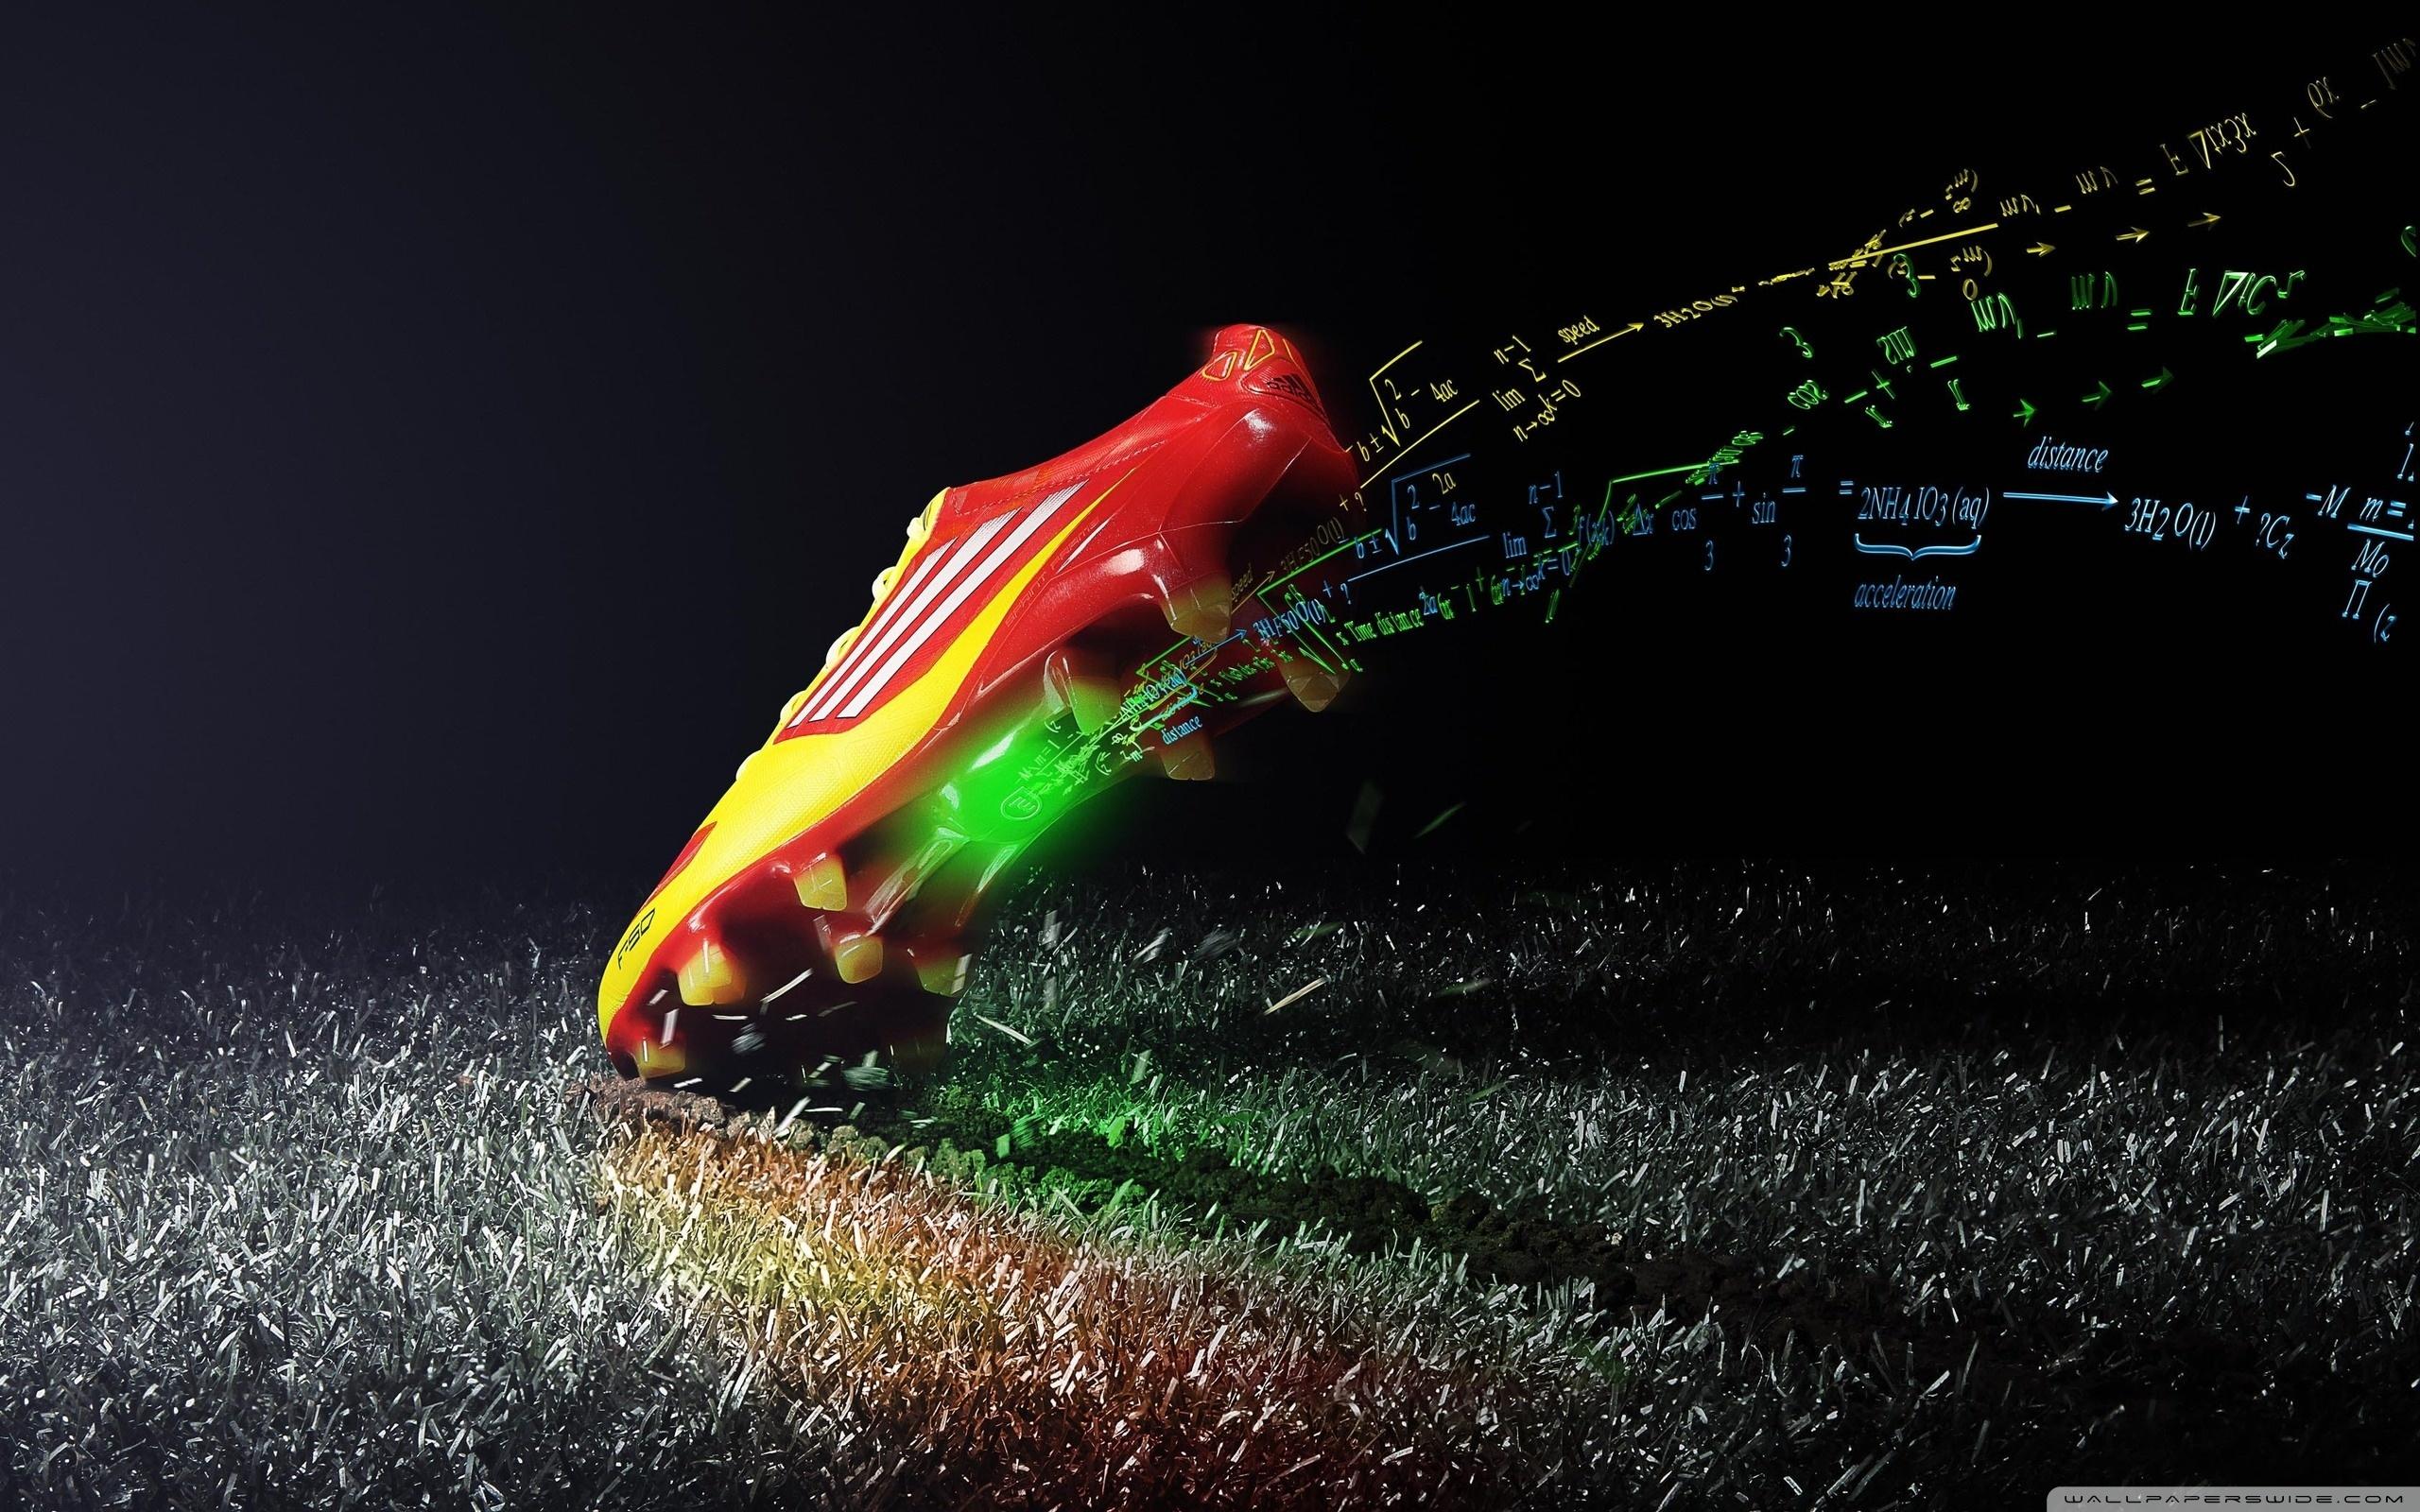 Football Wallpaper 4k 1060651   HD Wallpaper Backgrounds Download 2560x1600